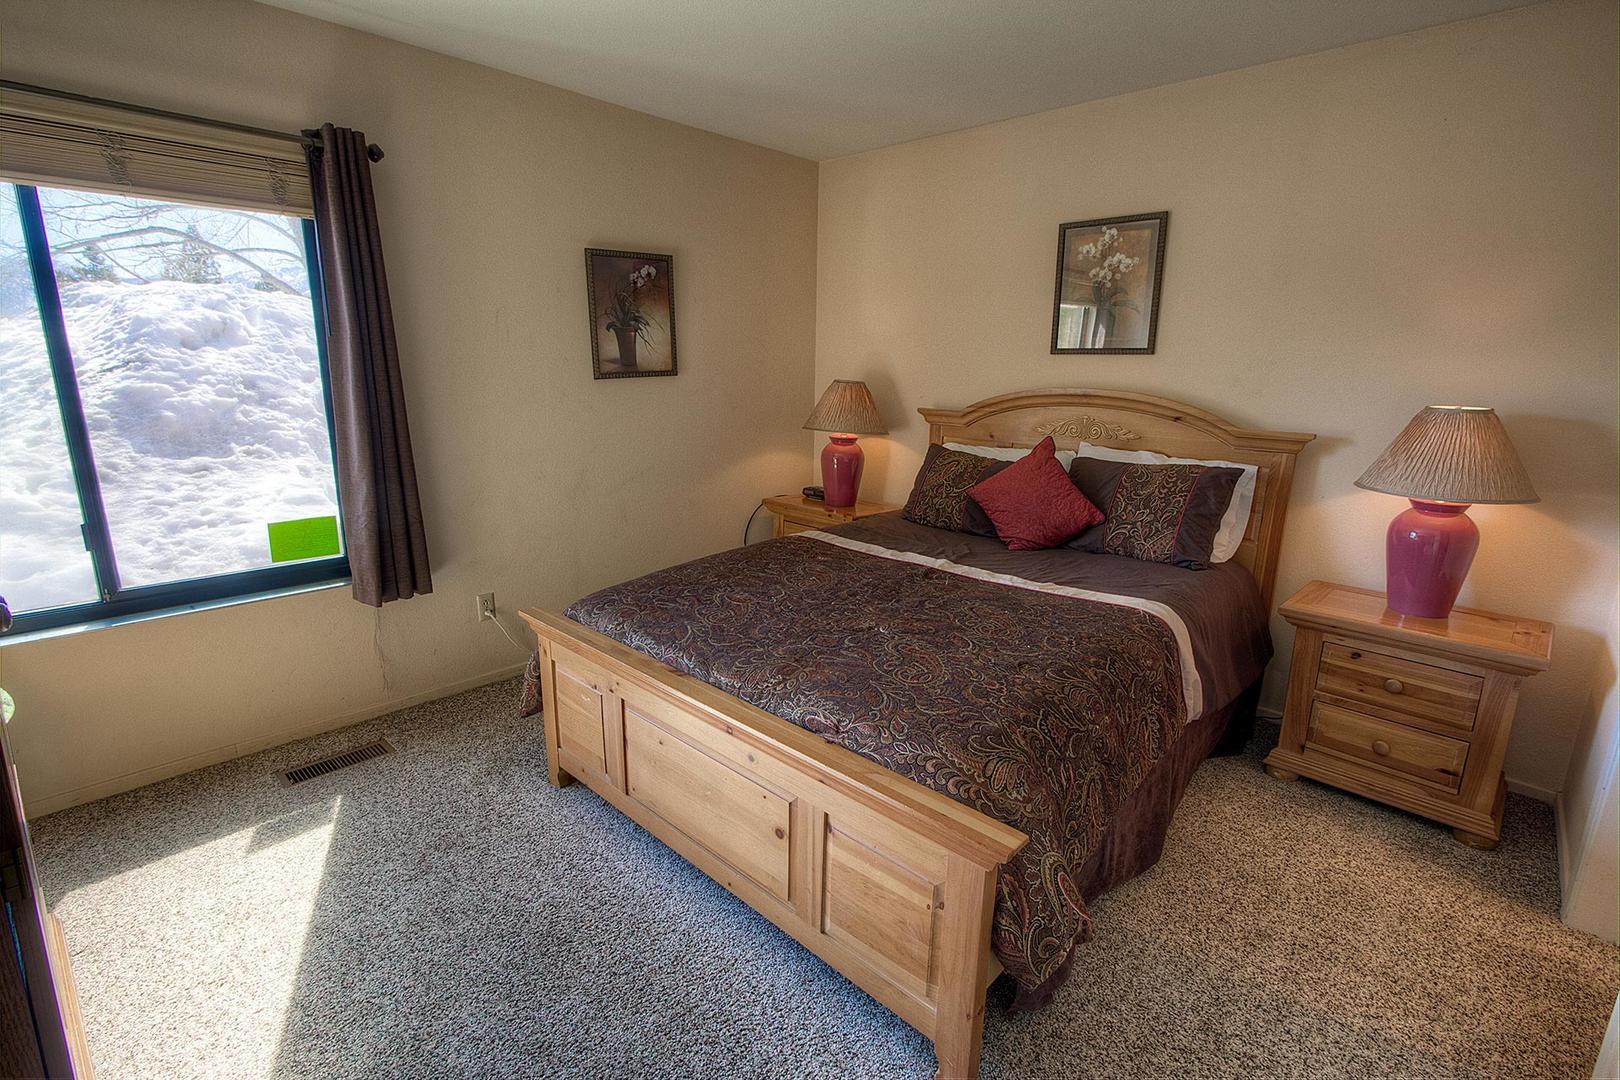 tkc0811 bedroom